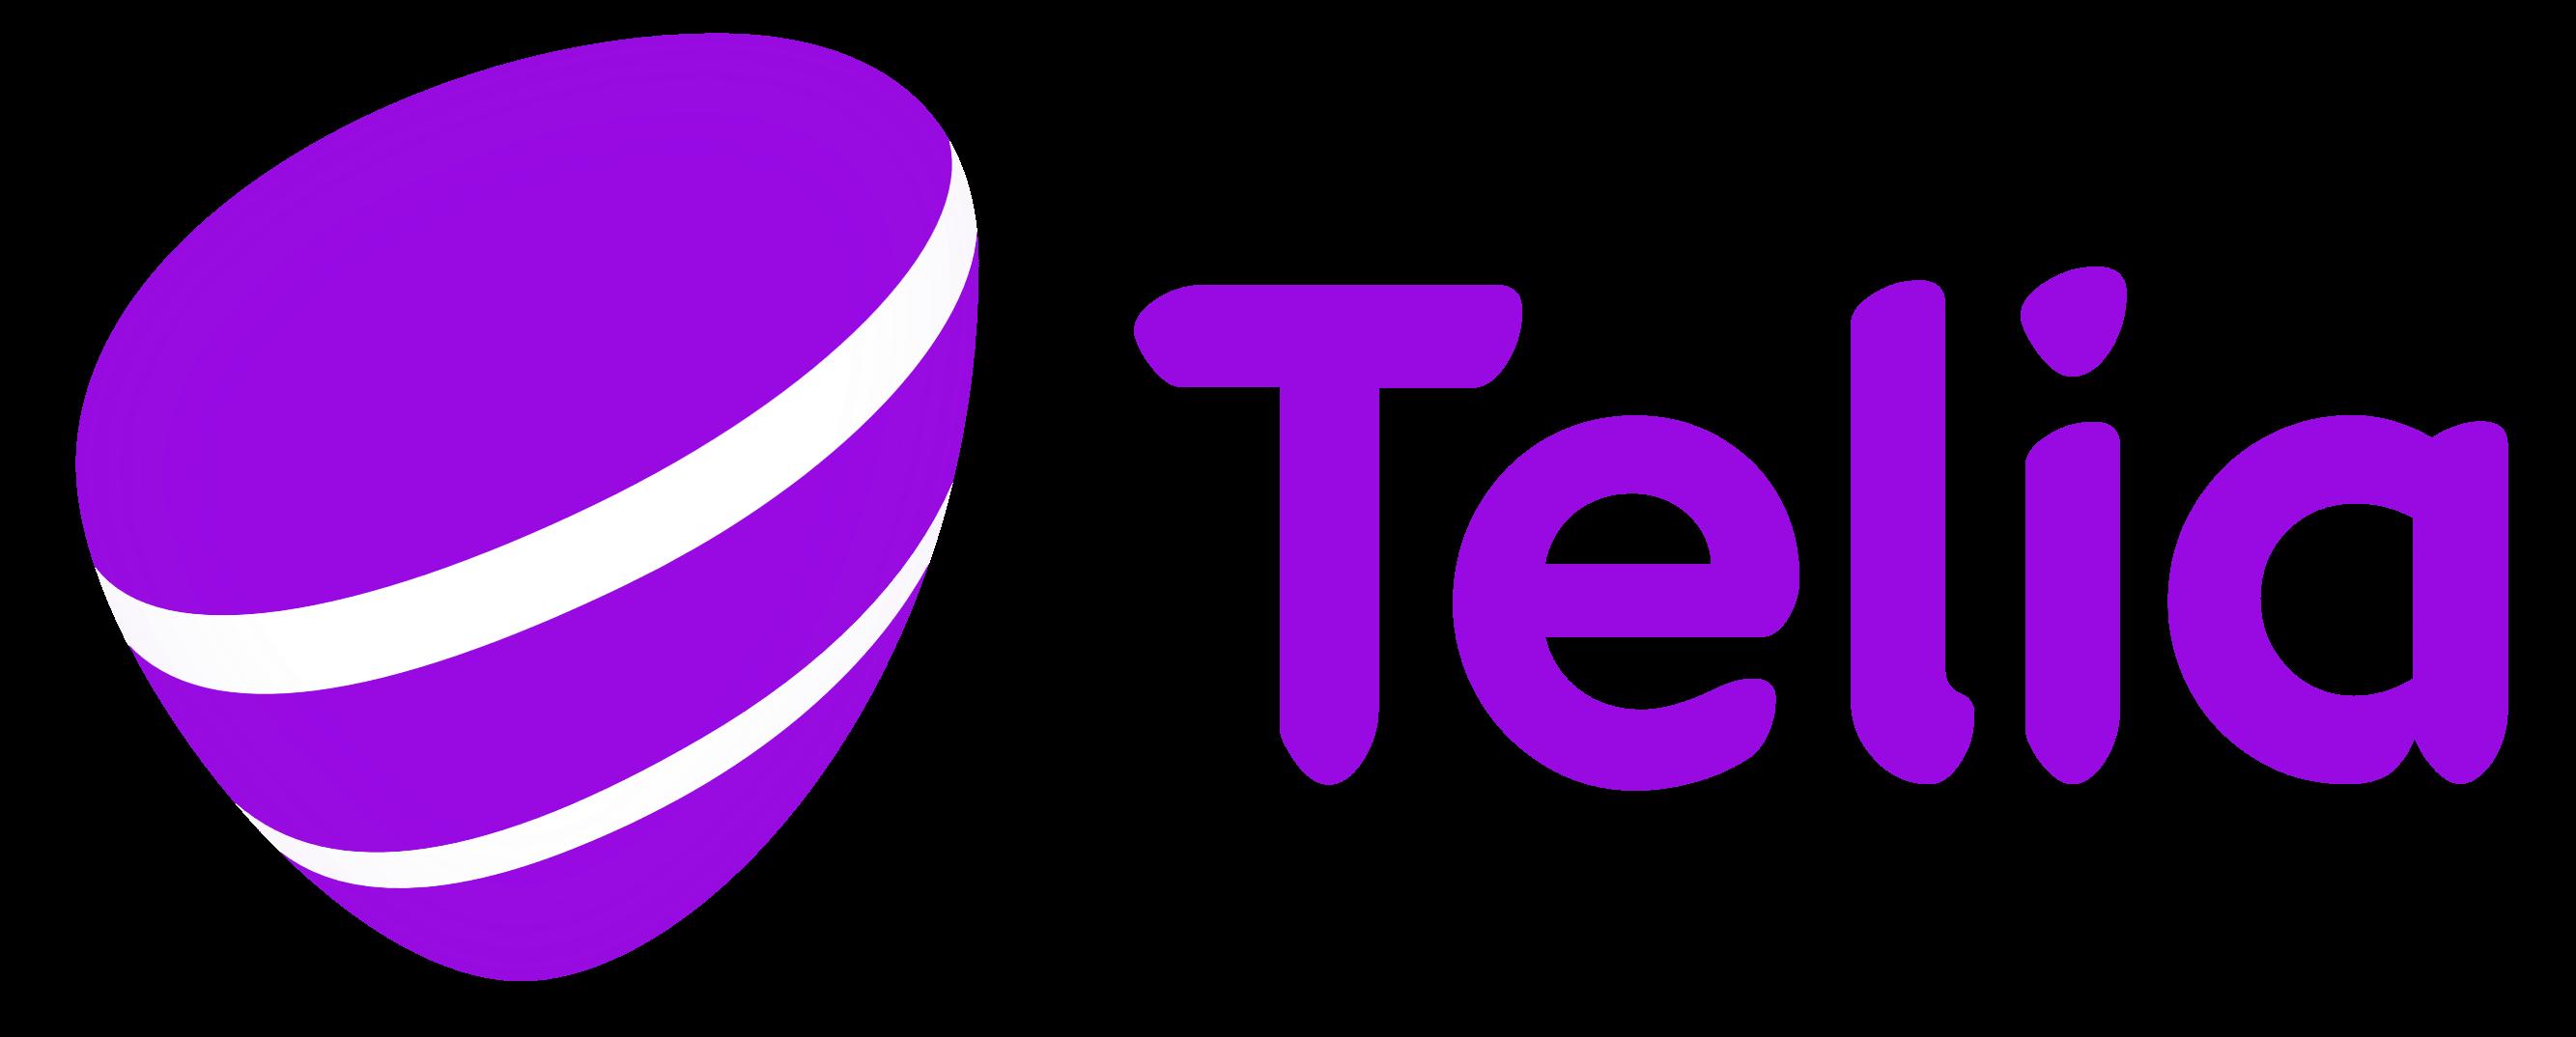 https://www.chasetek.com/wp-content/uploads/2018/02/Telia_logo.png